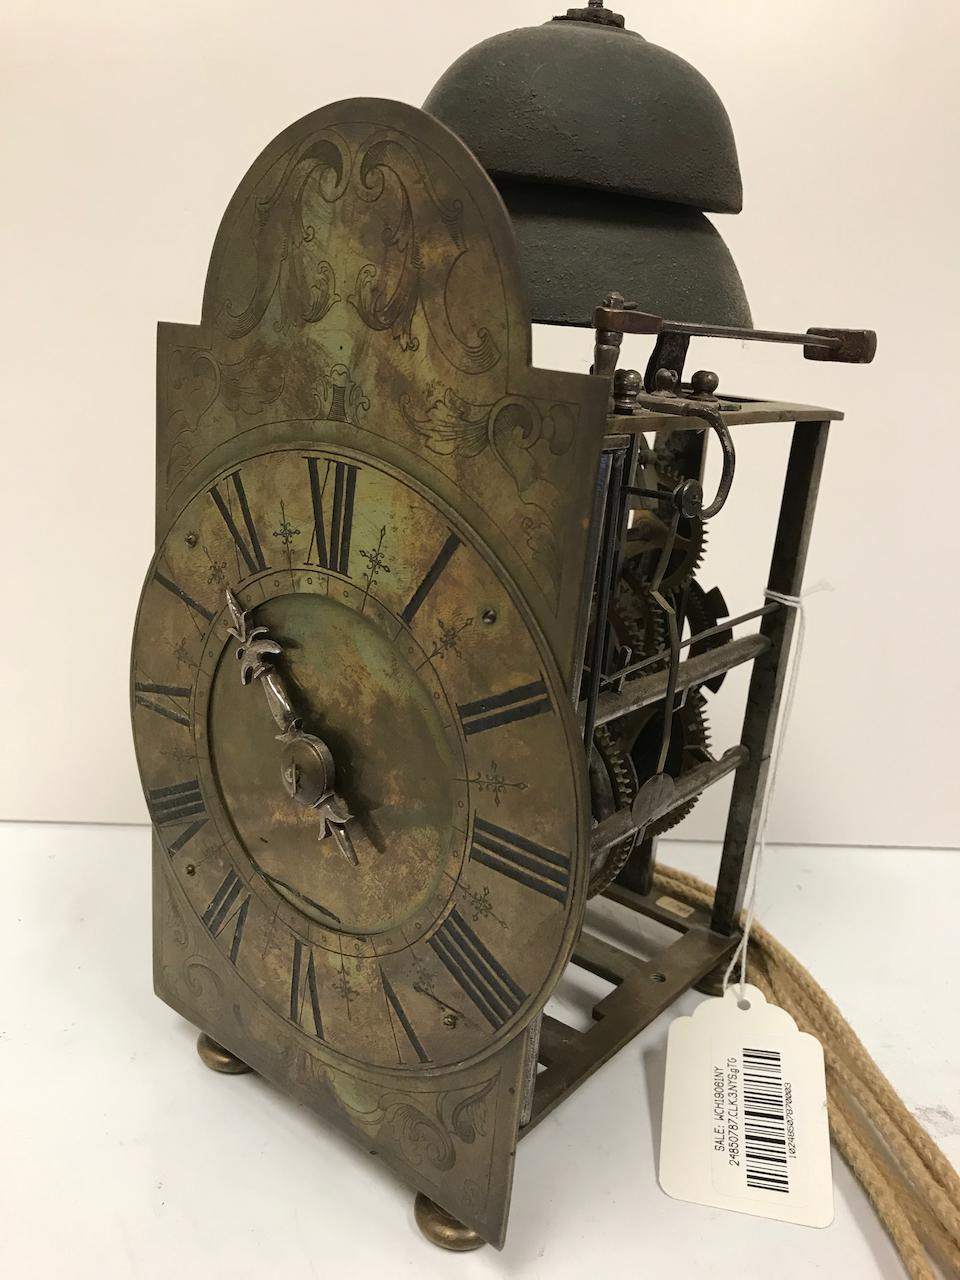 A rare Italian quarter striking chamber clockcirca 1700